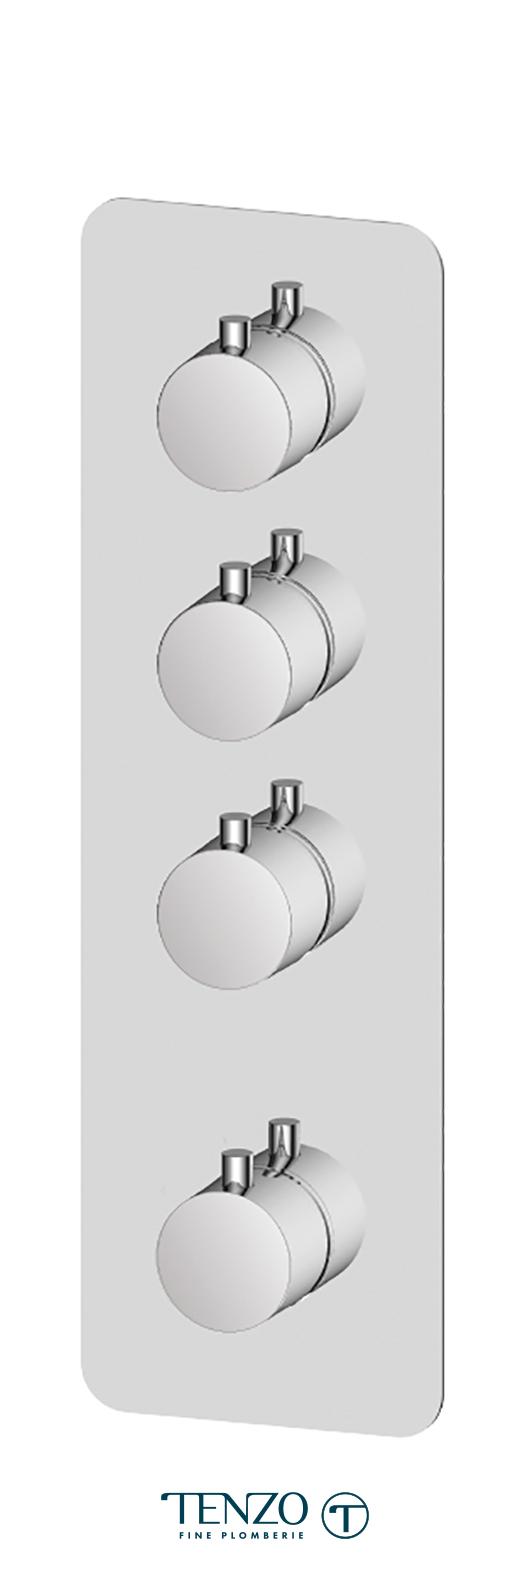 RUT43-CR - Extenza valve Rundo thermo. 3 functions chrome